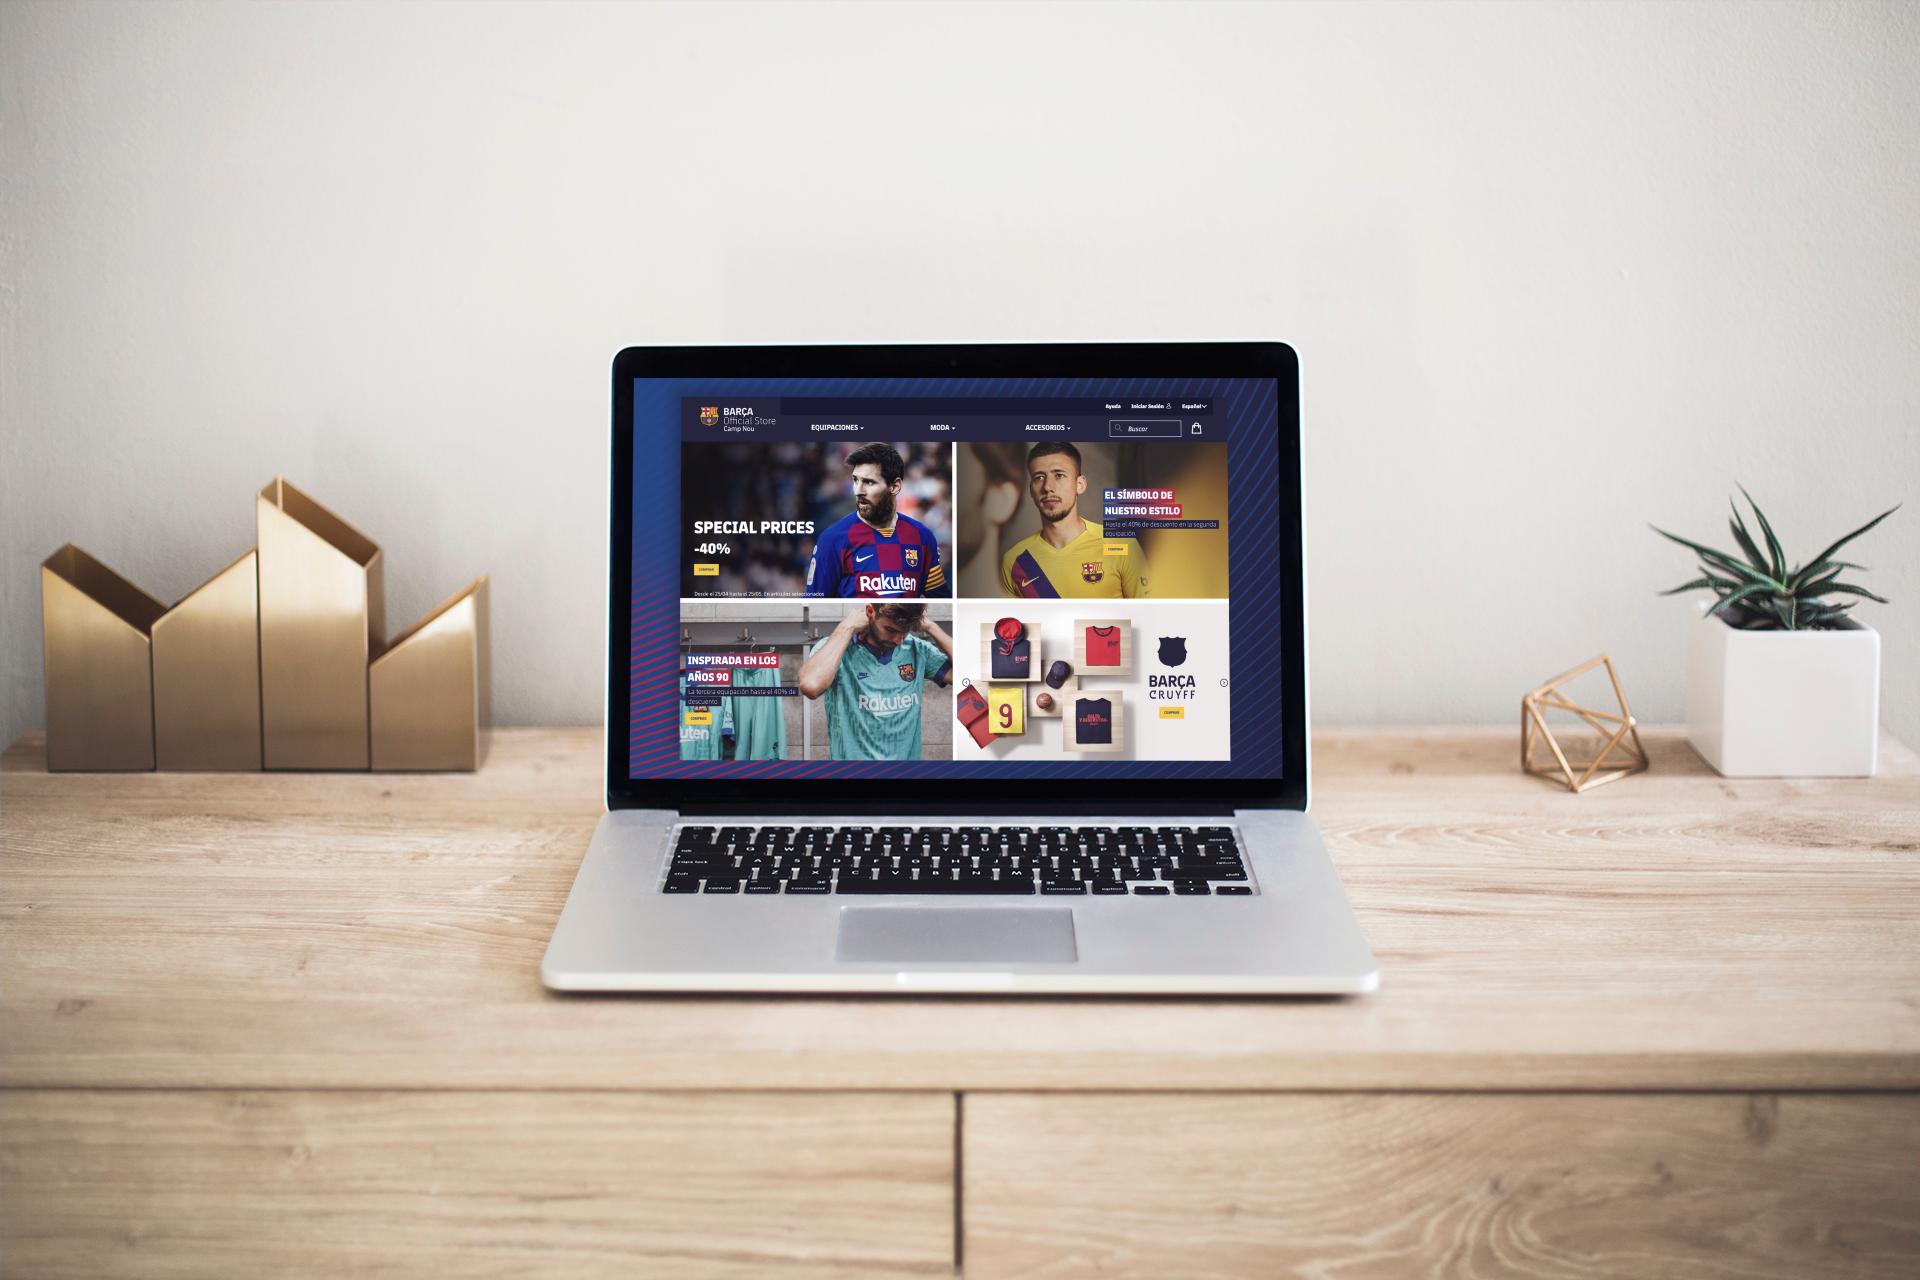 ¡El FC Barcelona lanza su propio e-Commerce!